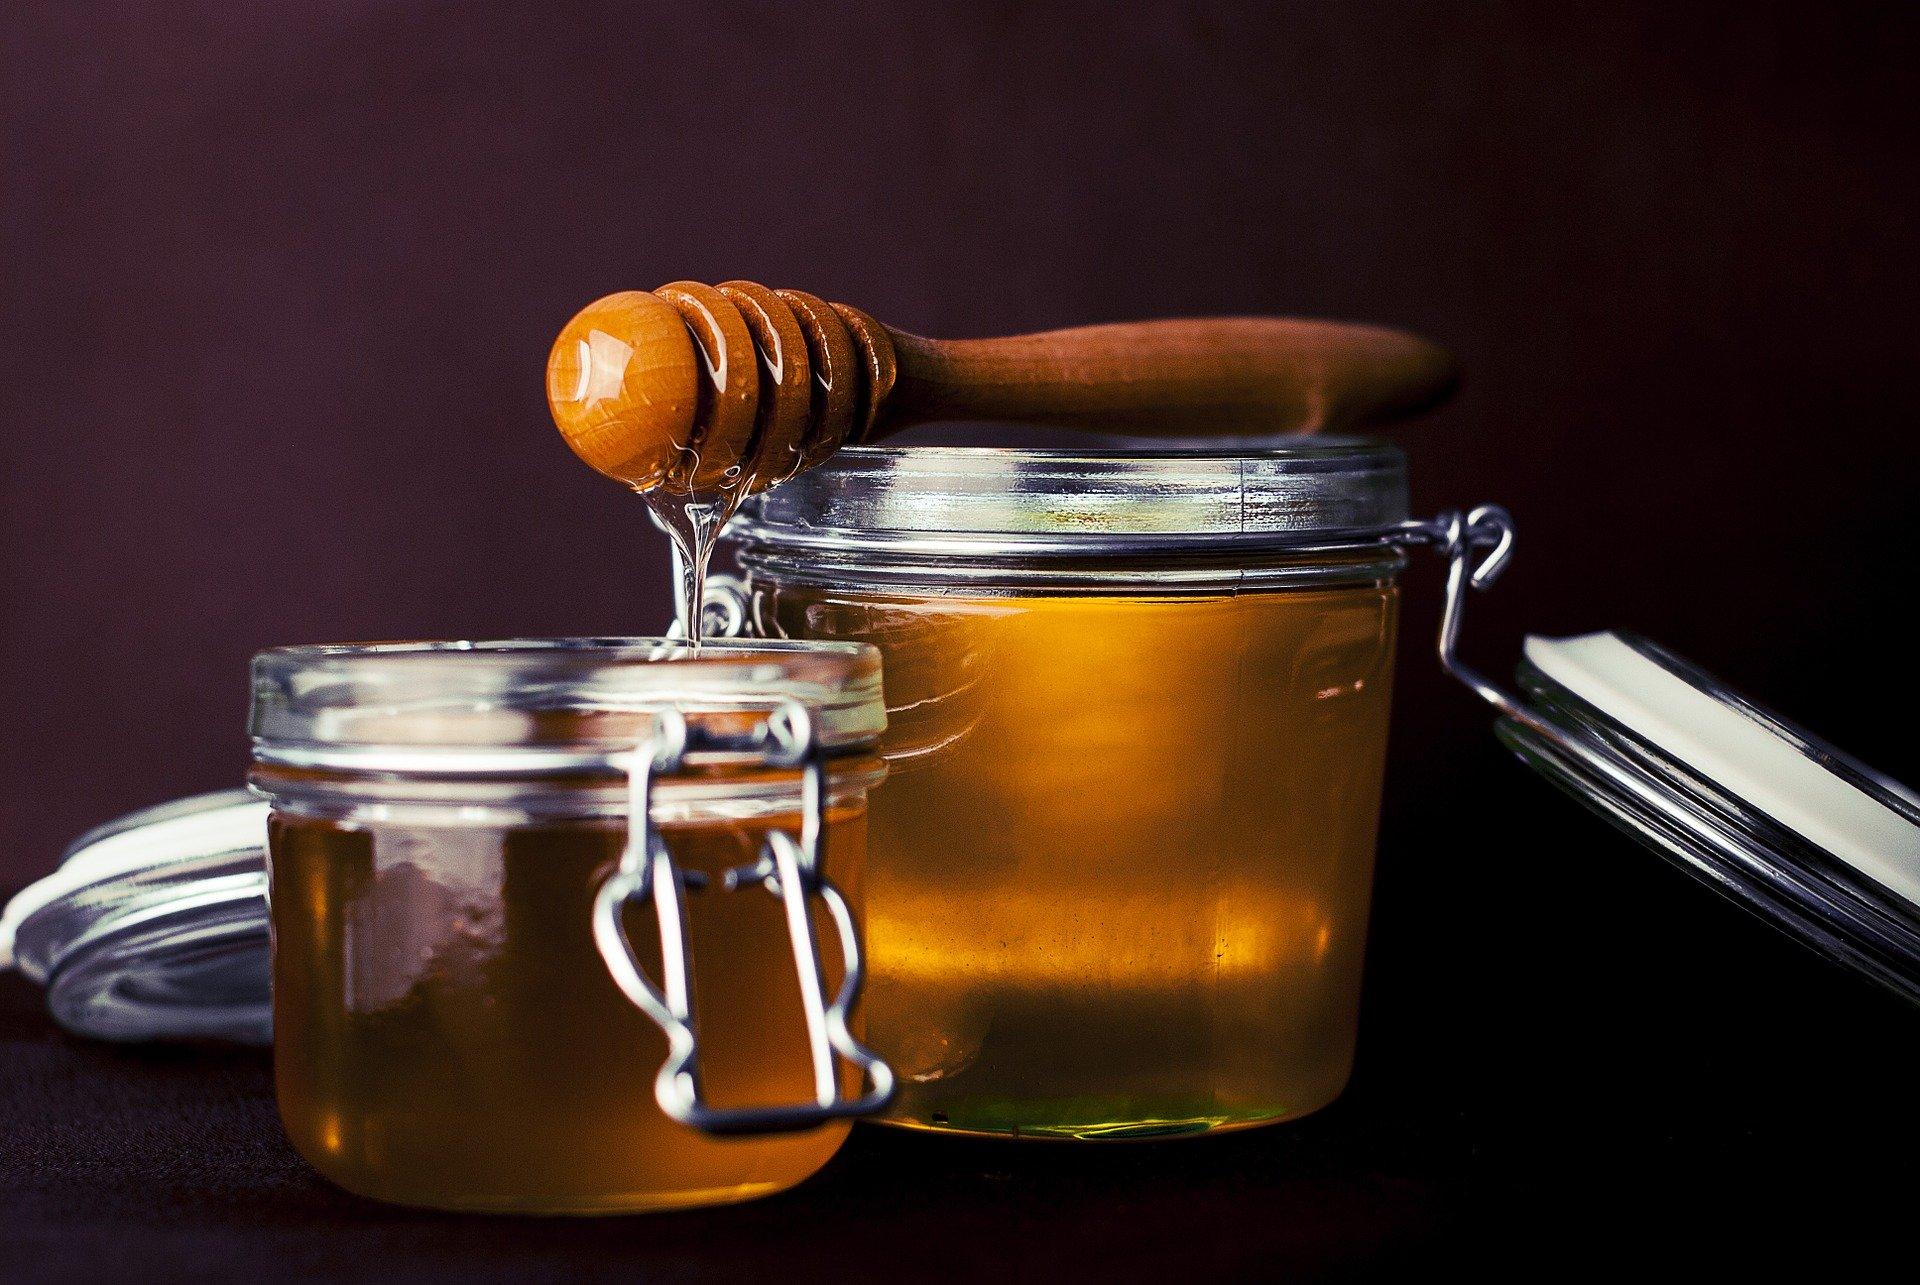 Honey and honey stick